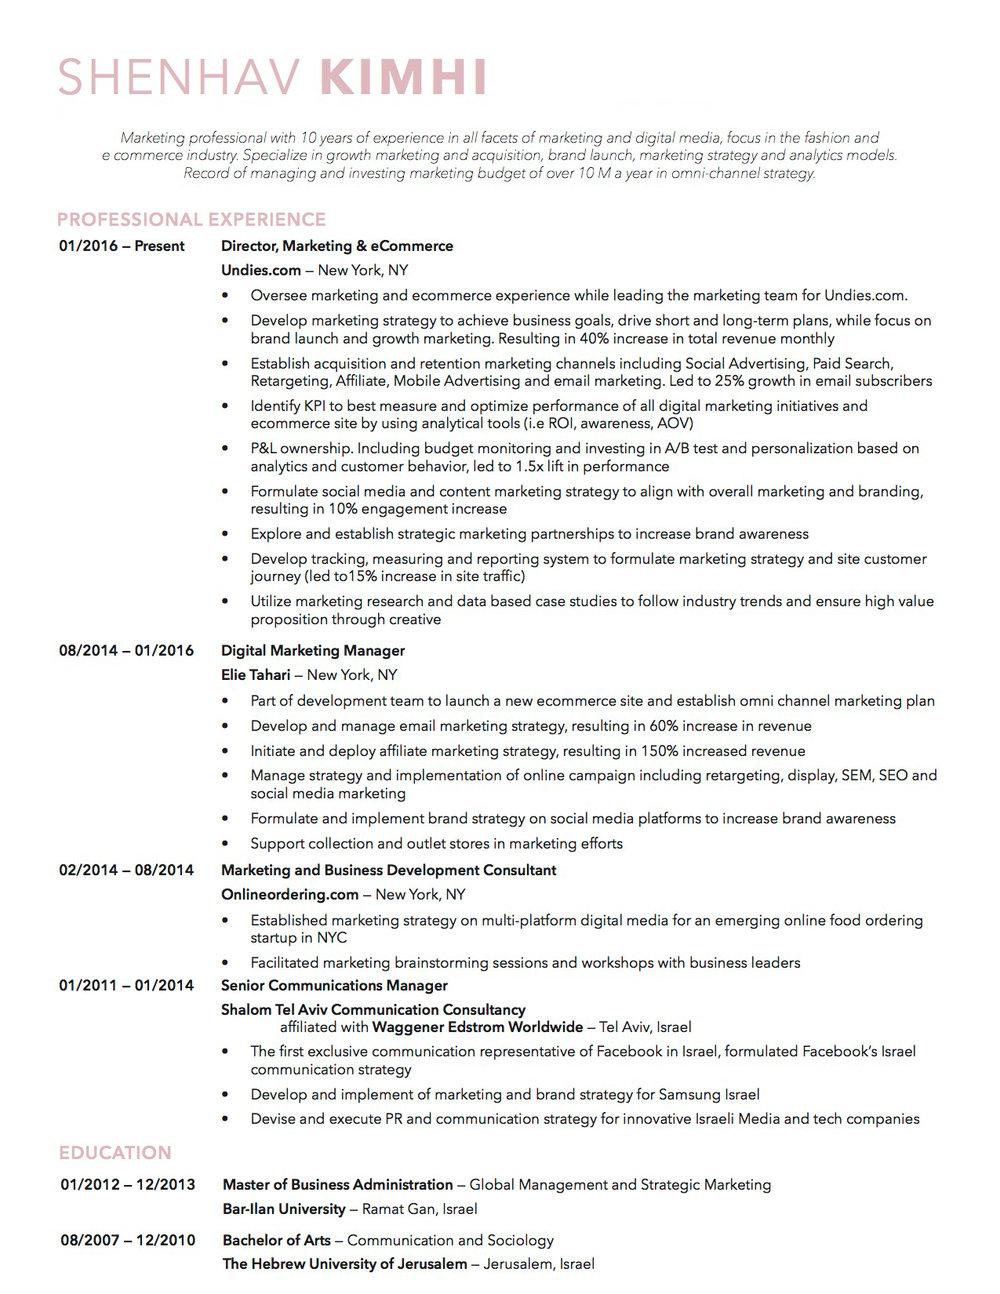 resume shenhav kimhi